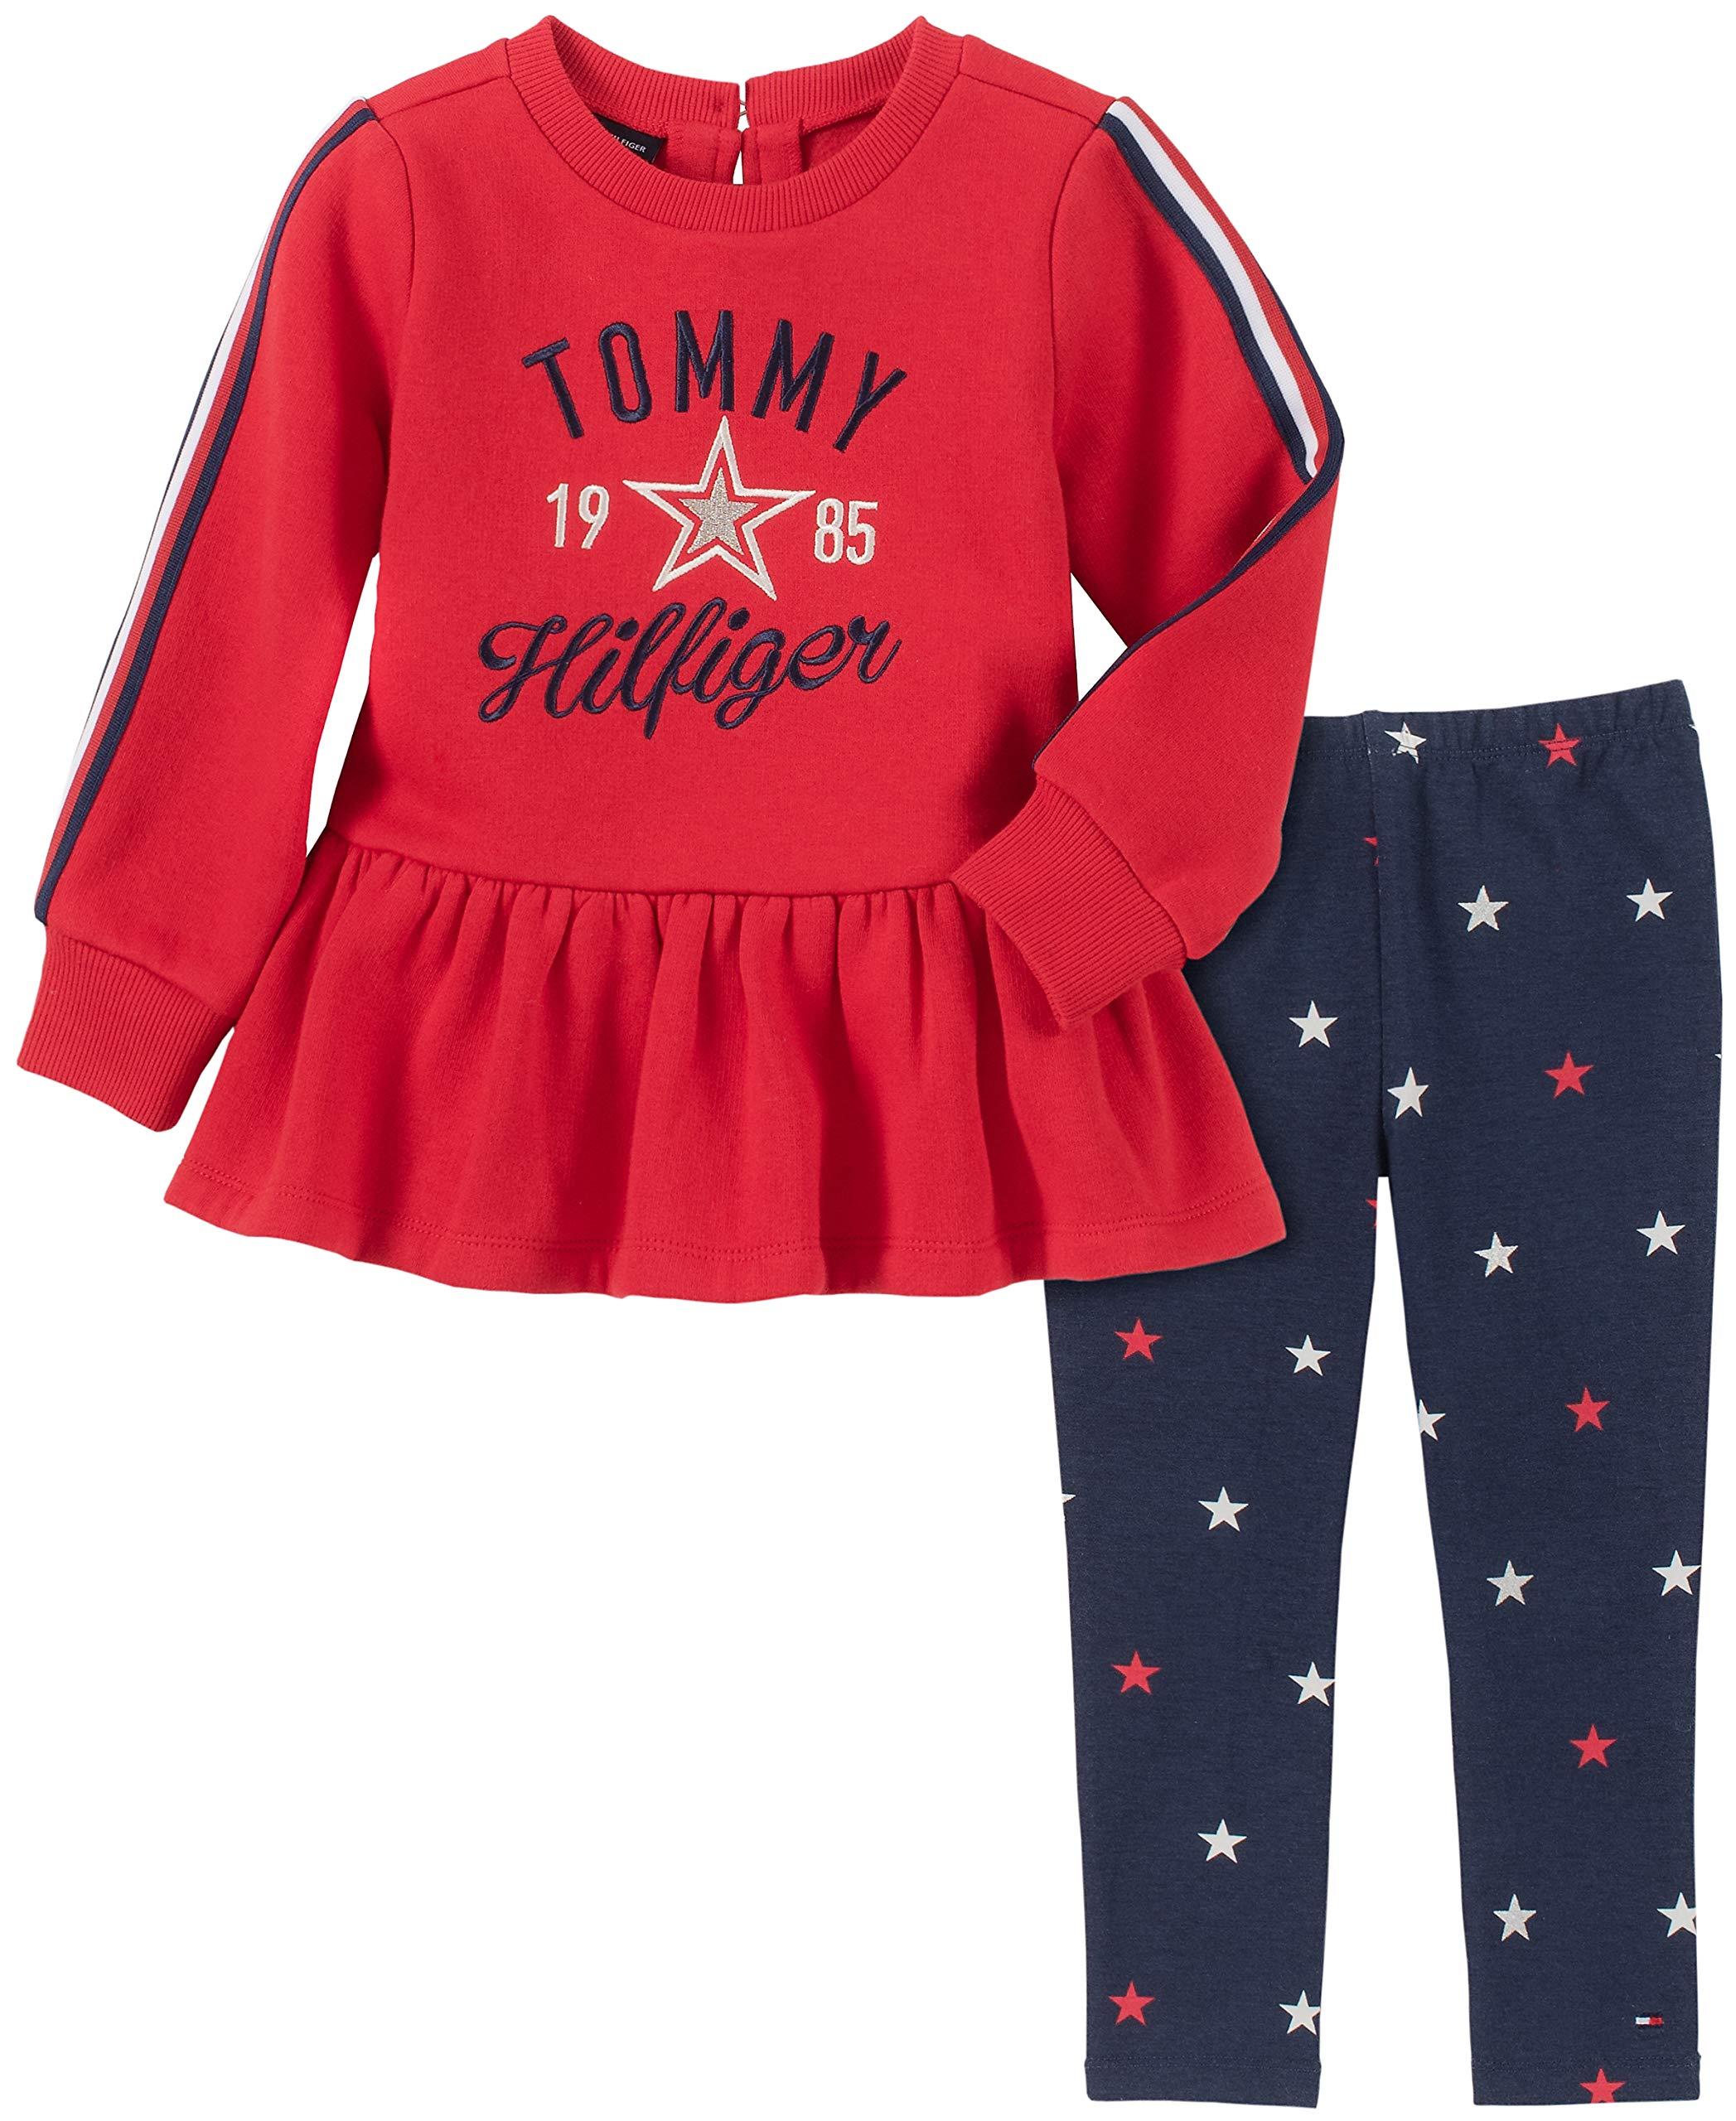 Tommy Hilfiger Girls' 2 Pieces Legging Set